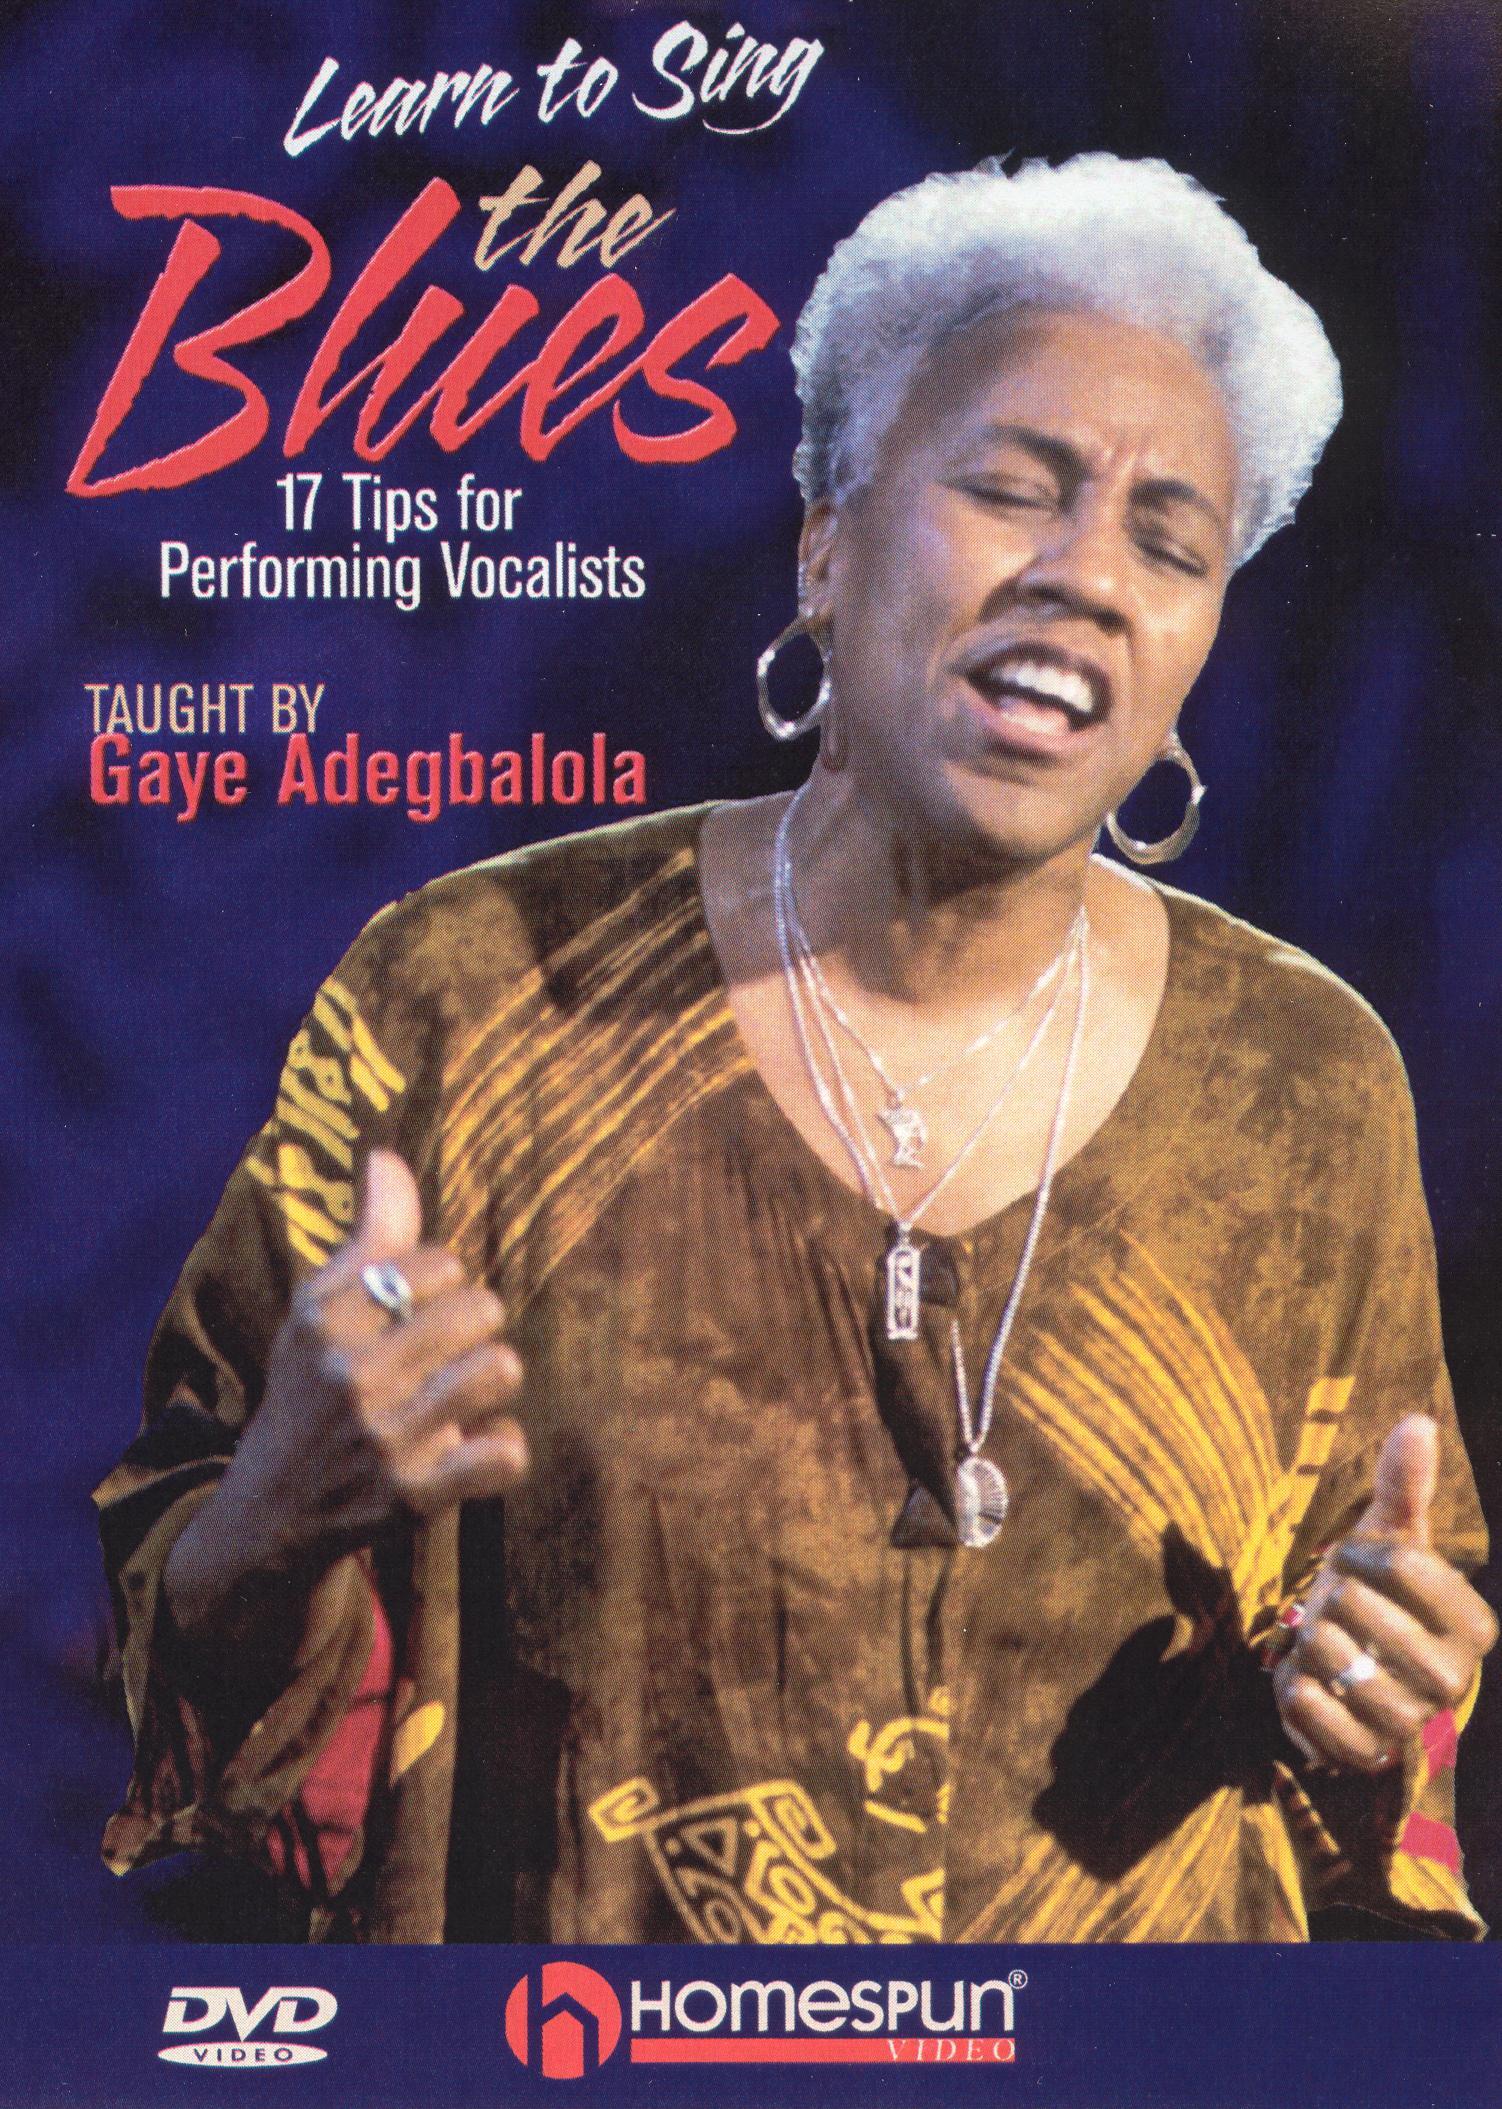 Gaye Adegbalola: Learn to Sing the Blues